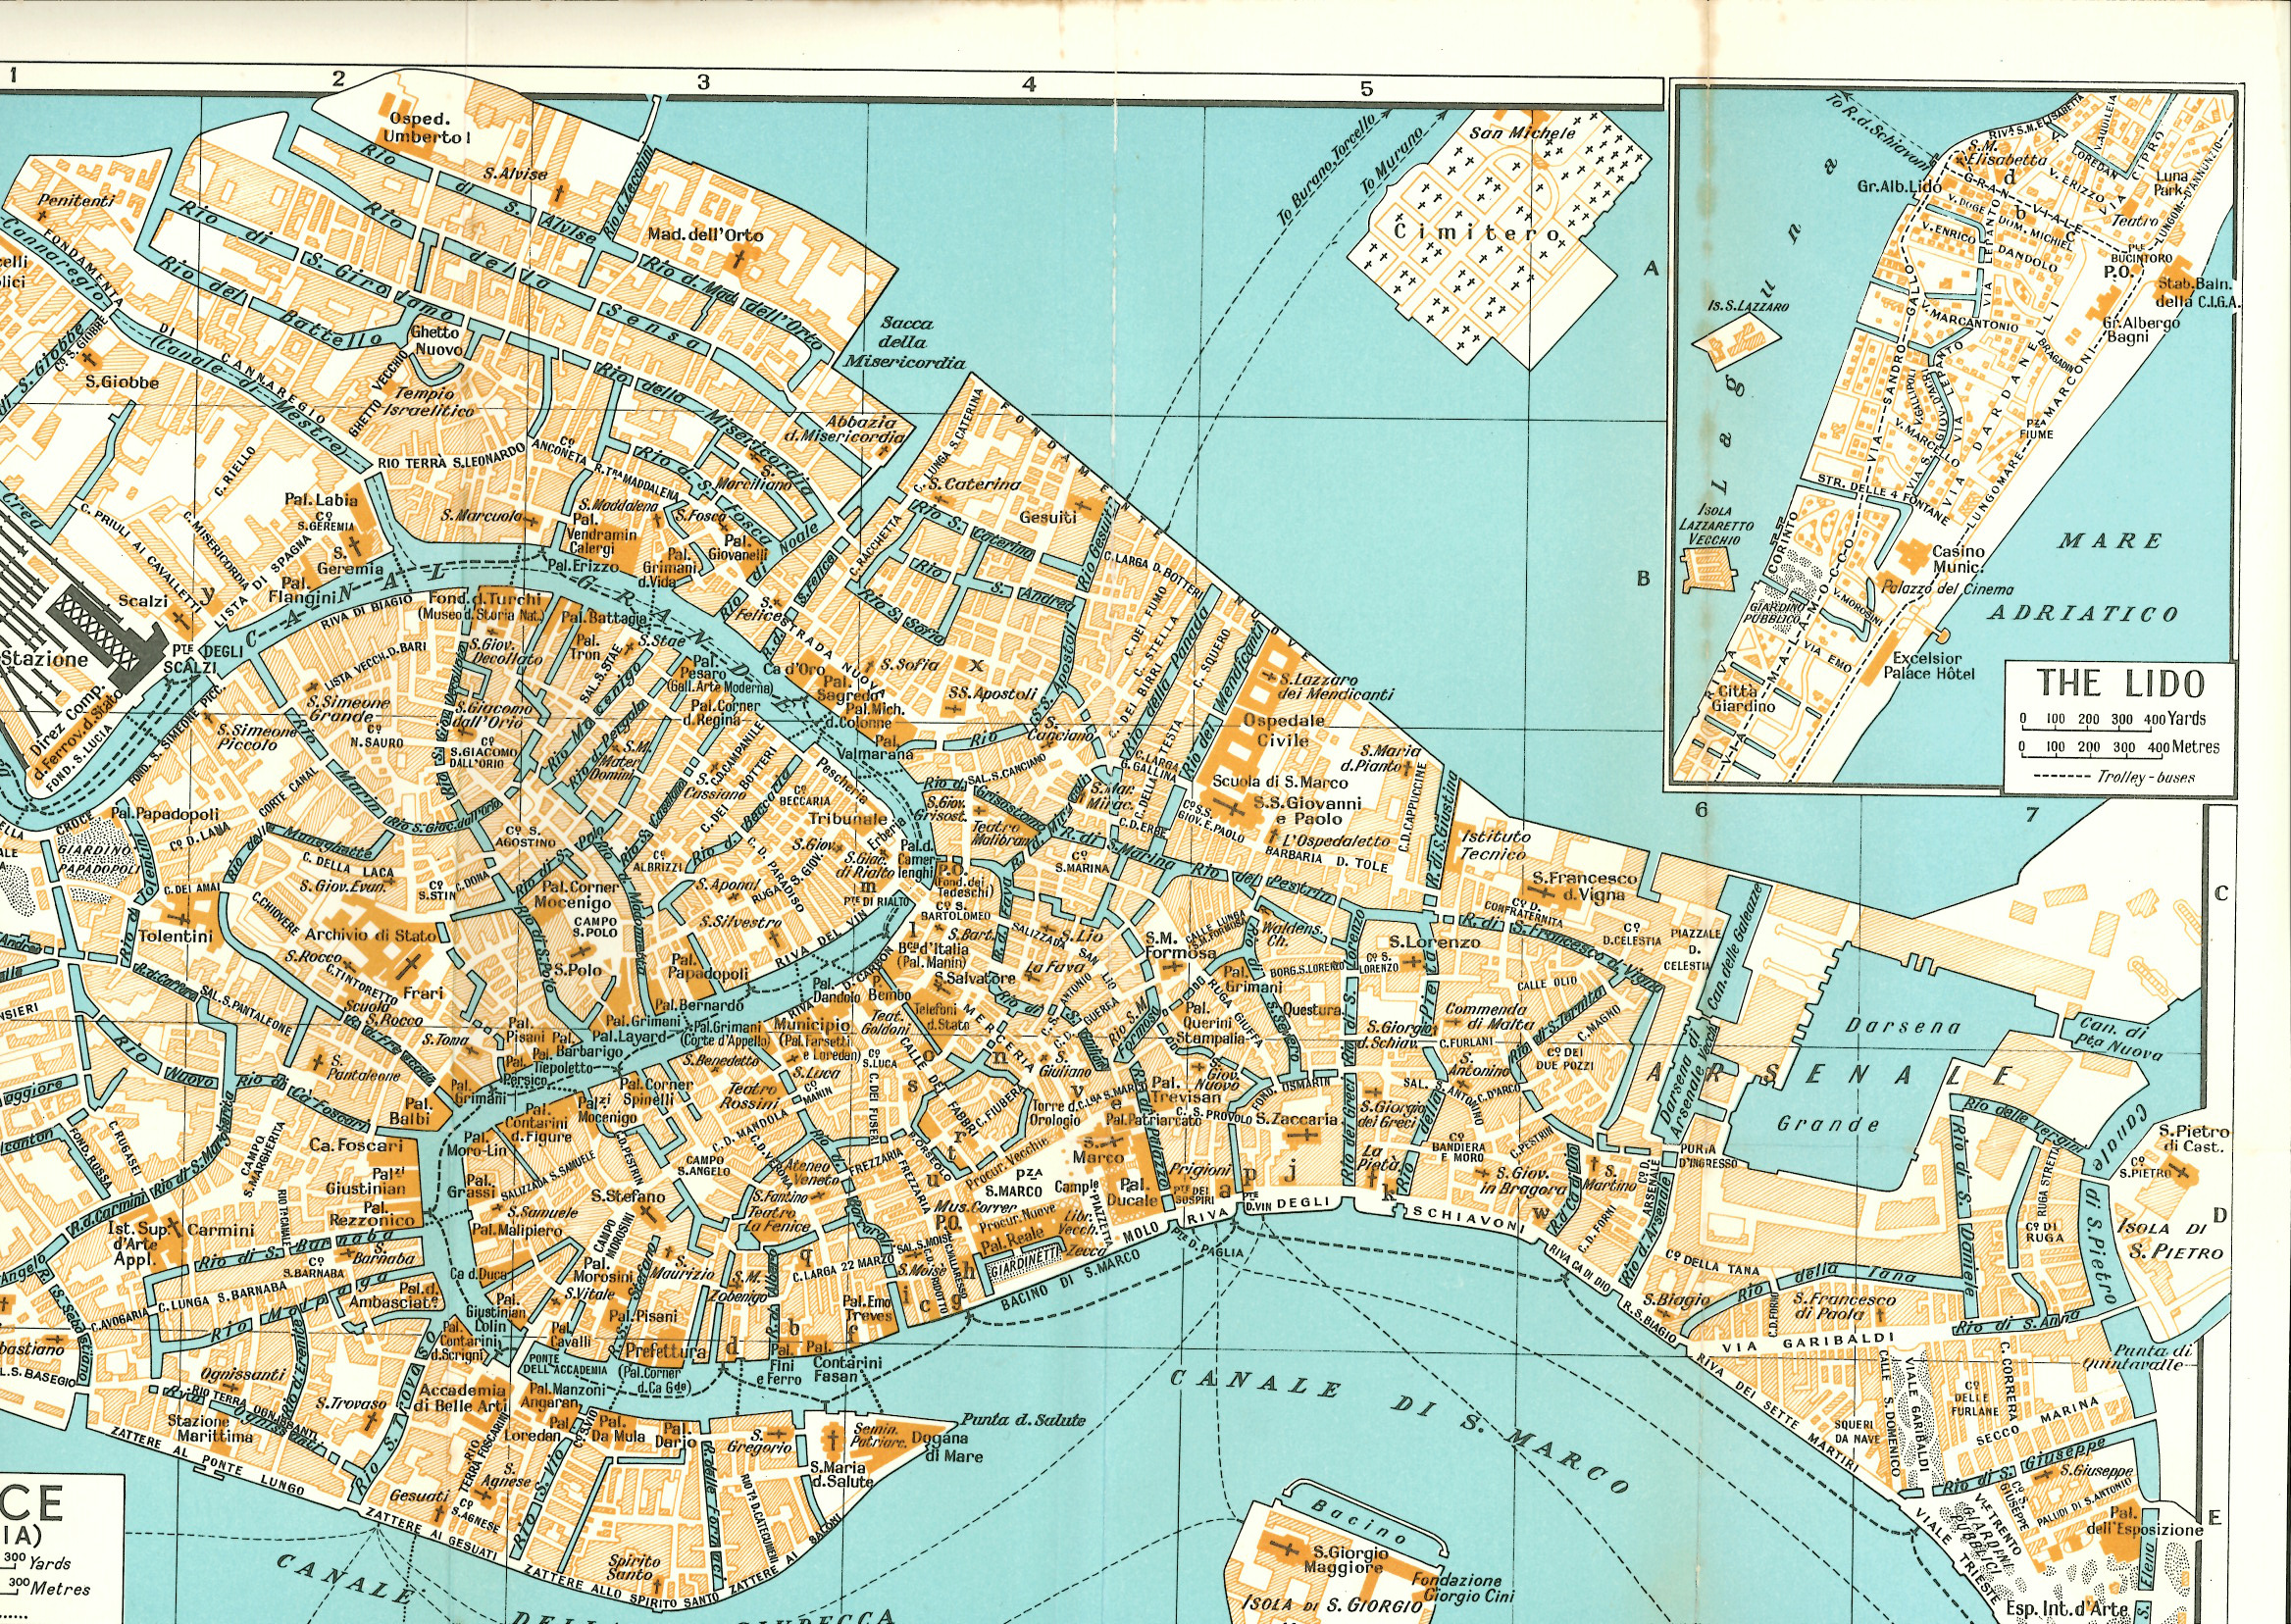 Venice - historic map with Isola San Giorgio